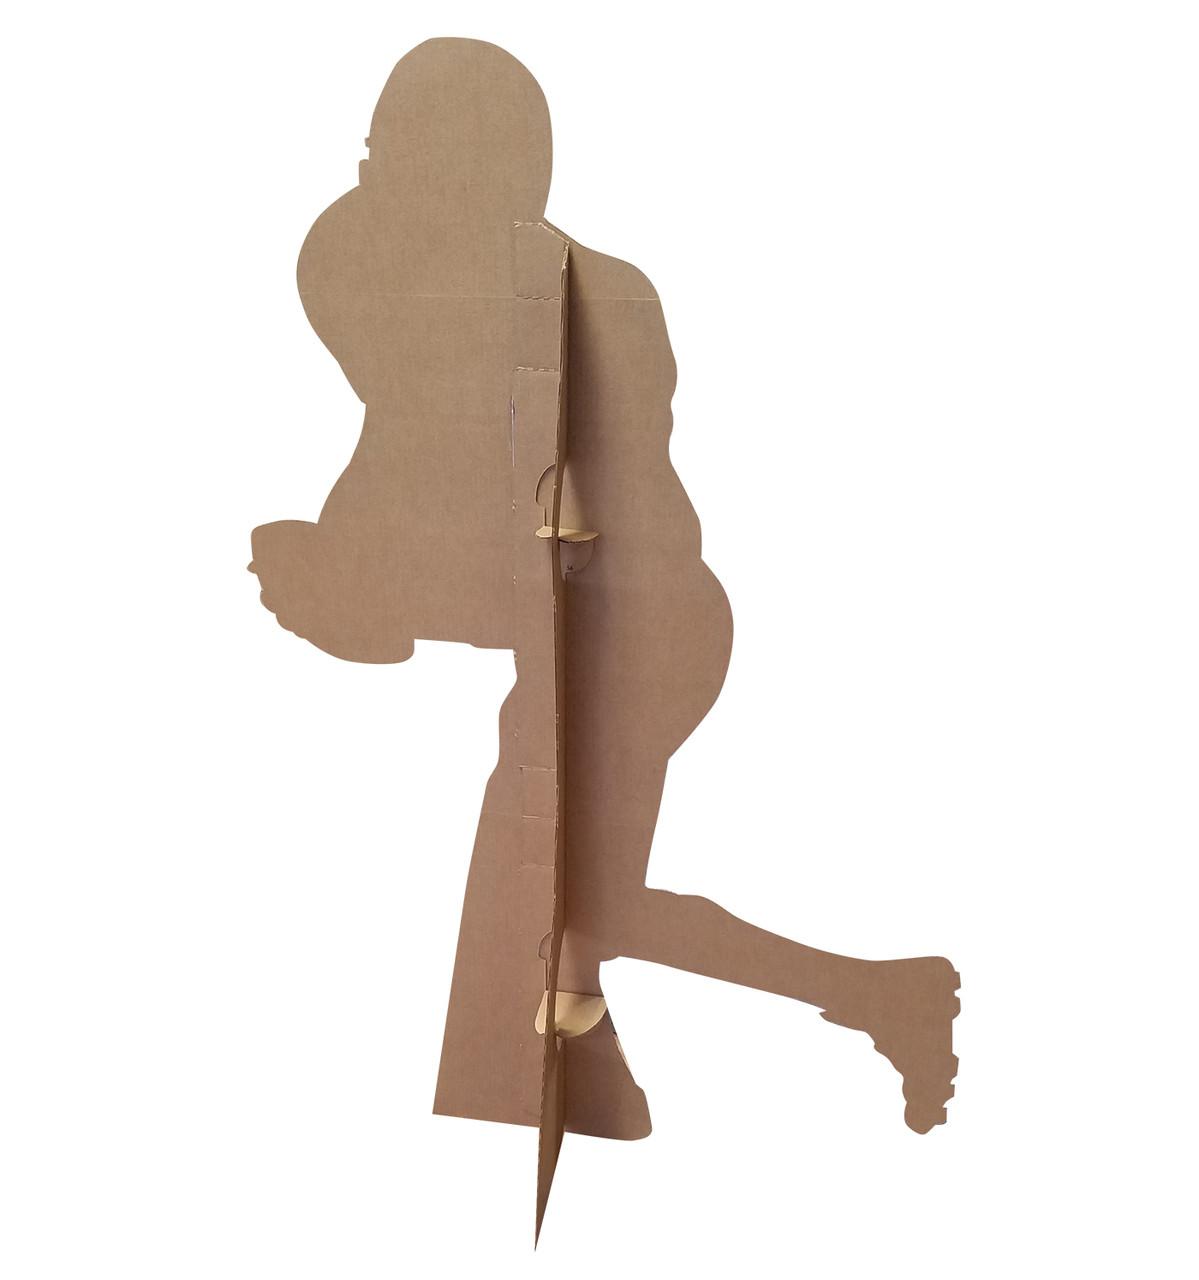 Football Player Running Silhouette-Cardboard Cutout 2394